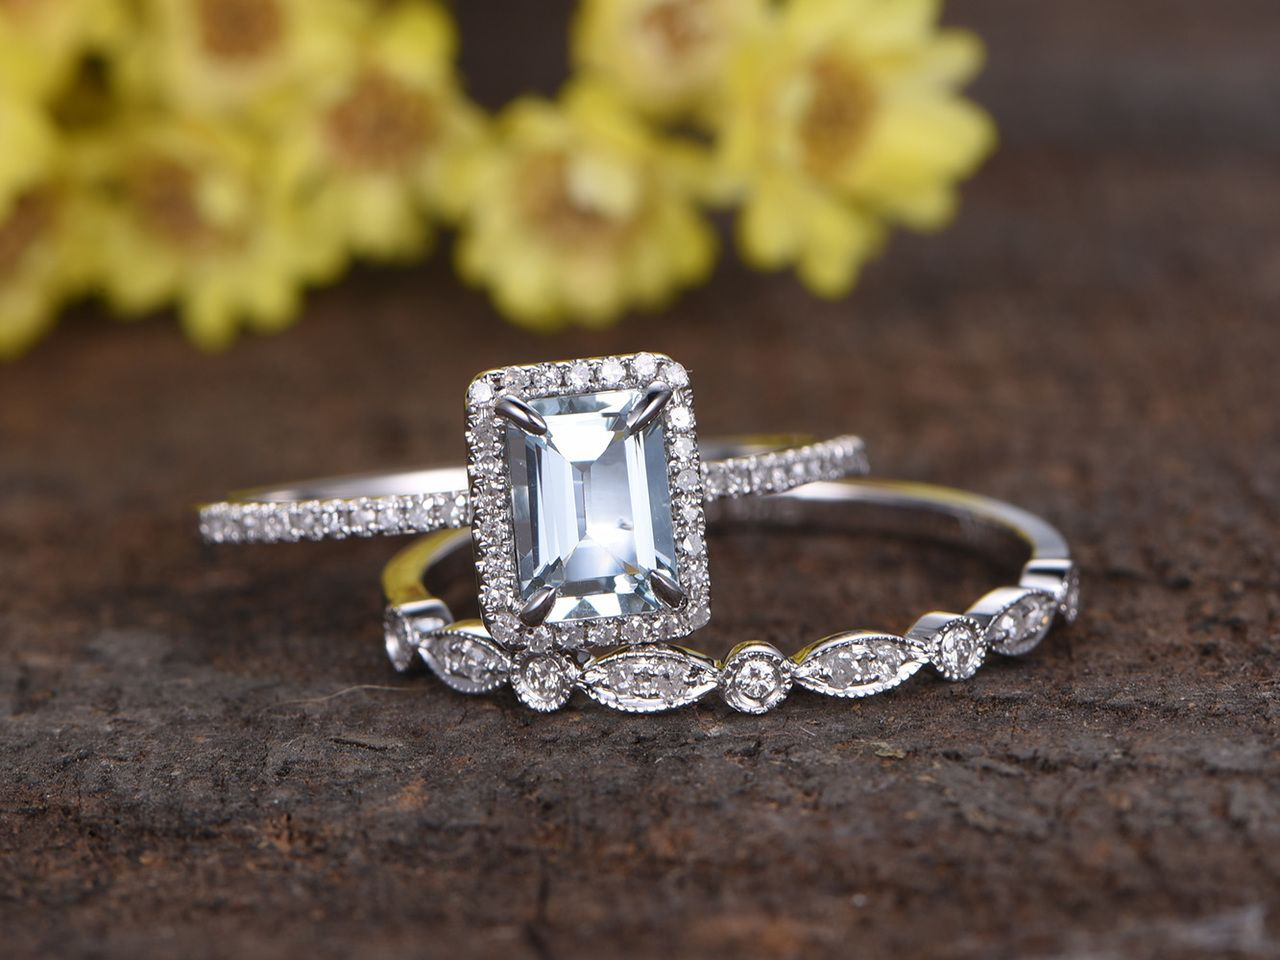 aquamarine wedding rings 1 Carat Emerald Cut Aquamarine Wedding Ring Set Diamond Matching Band 14k White Gold Art Deco